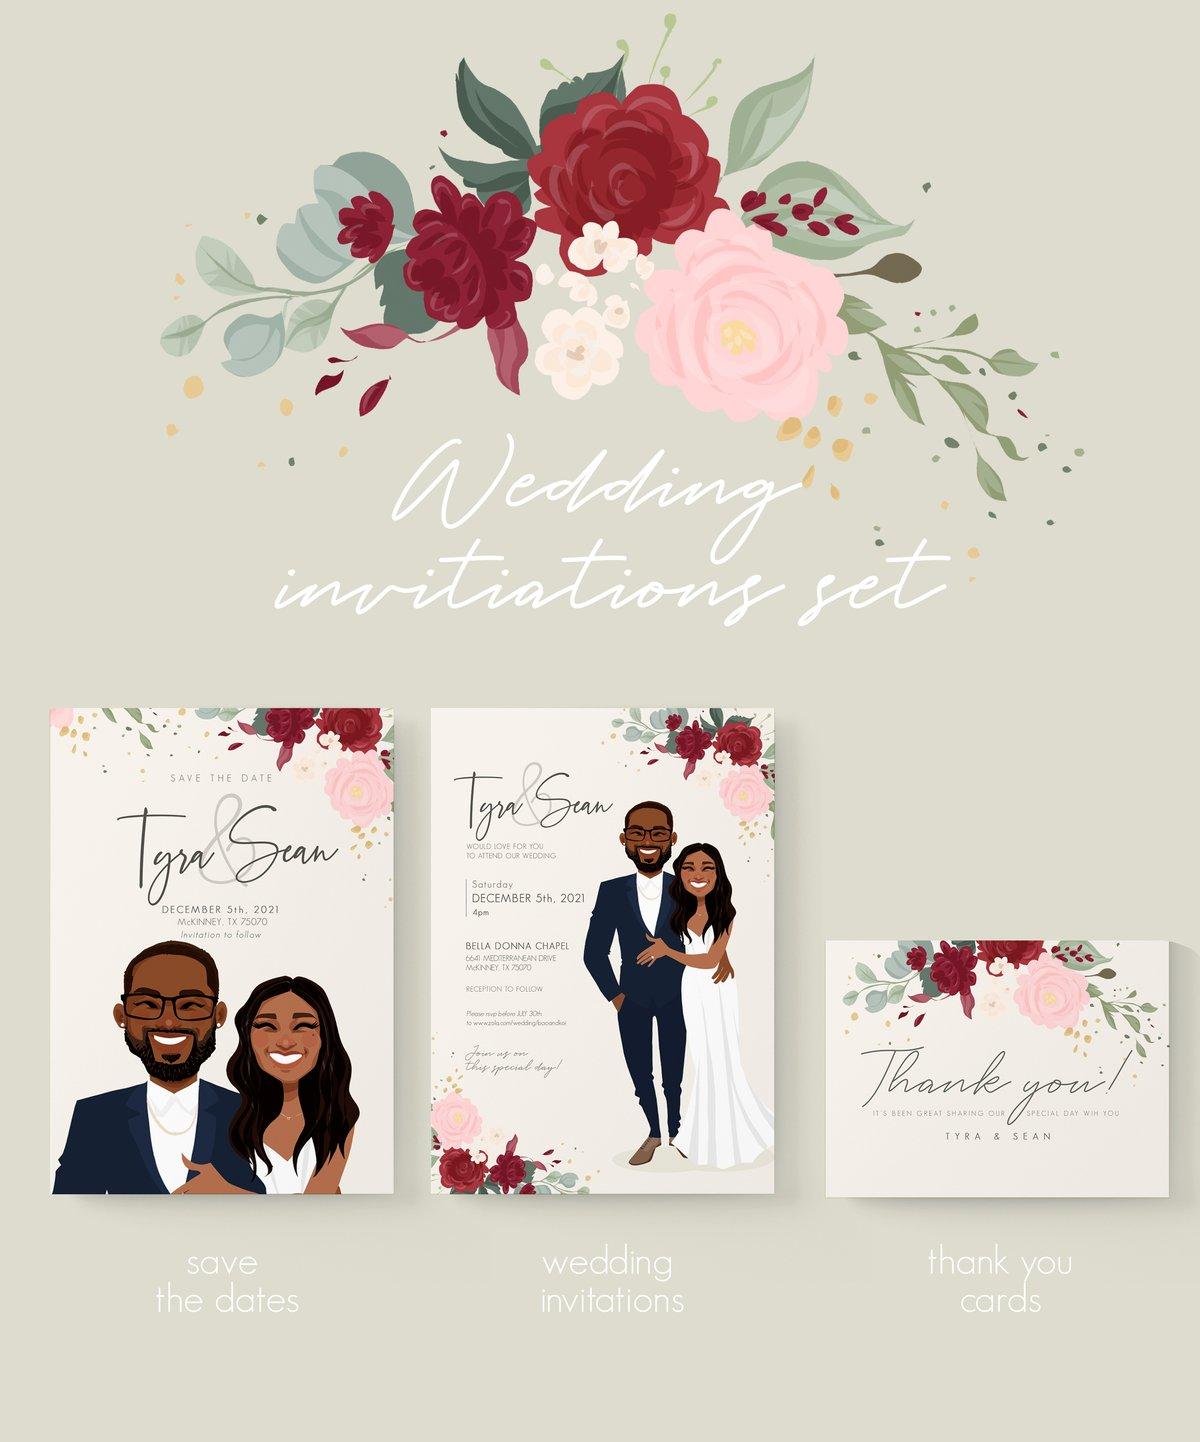 Image of Wedding invitations set